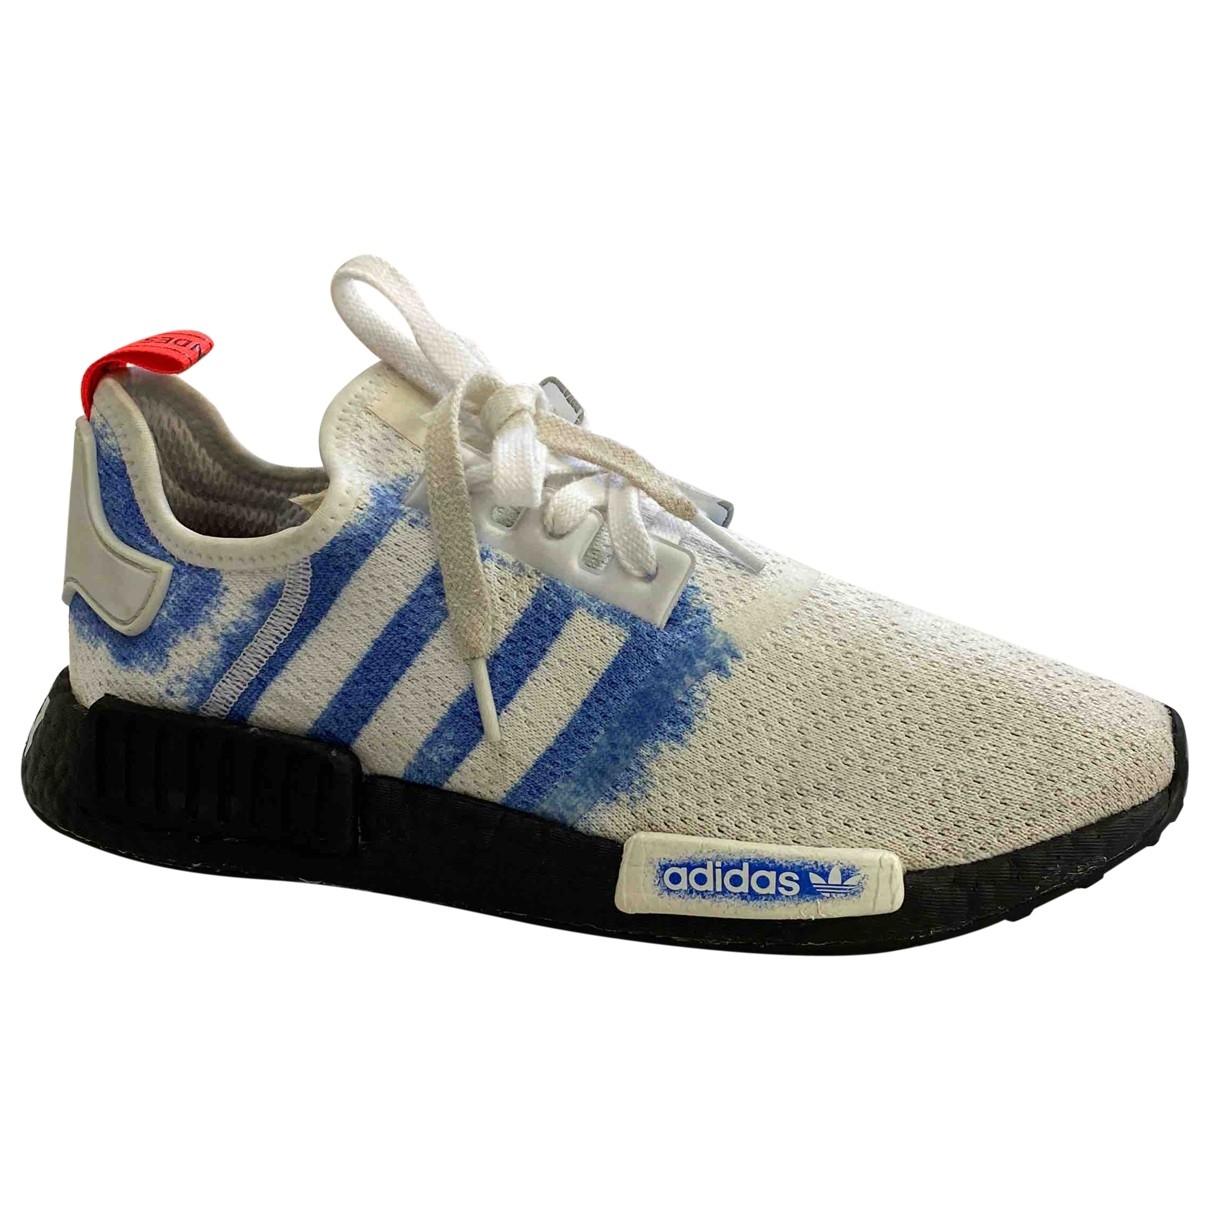 Adidas - Baskets Nmd pour homme en toile